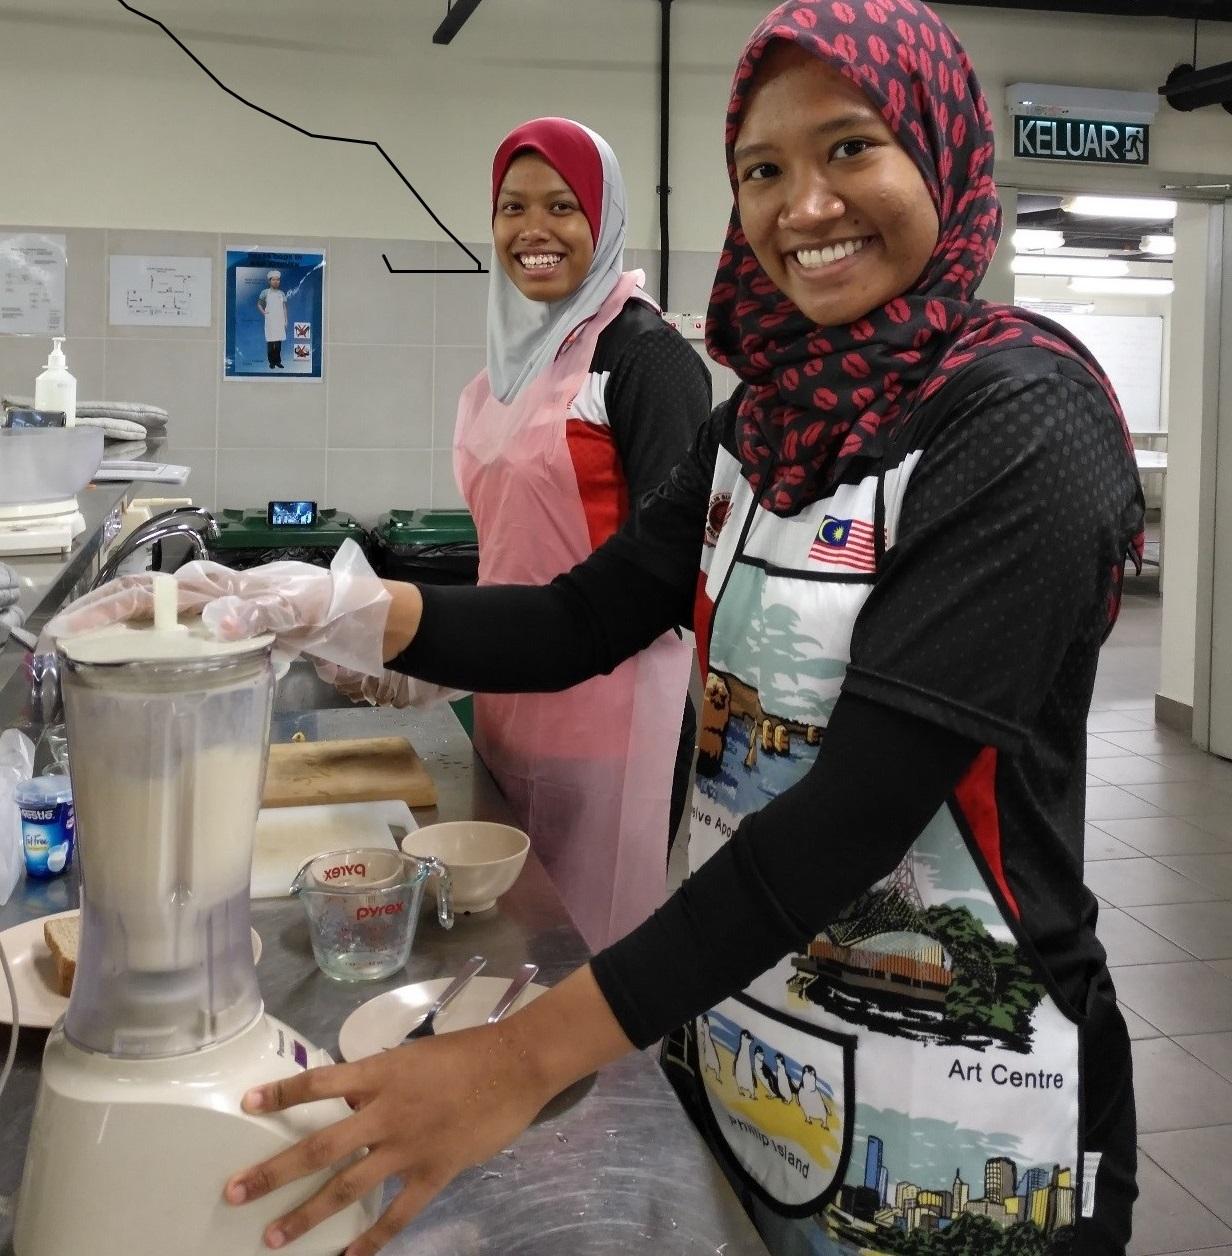 Malaysian athletes prepare snack at IMU